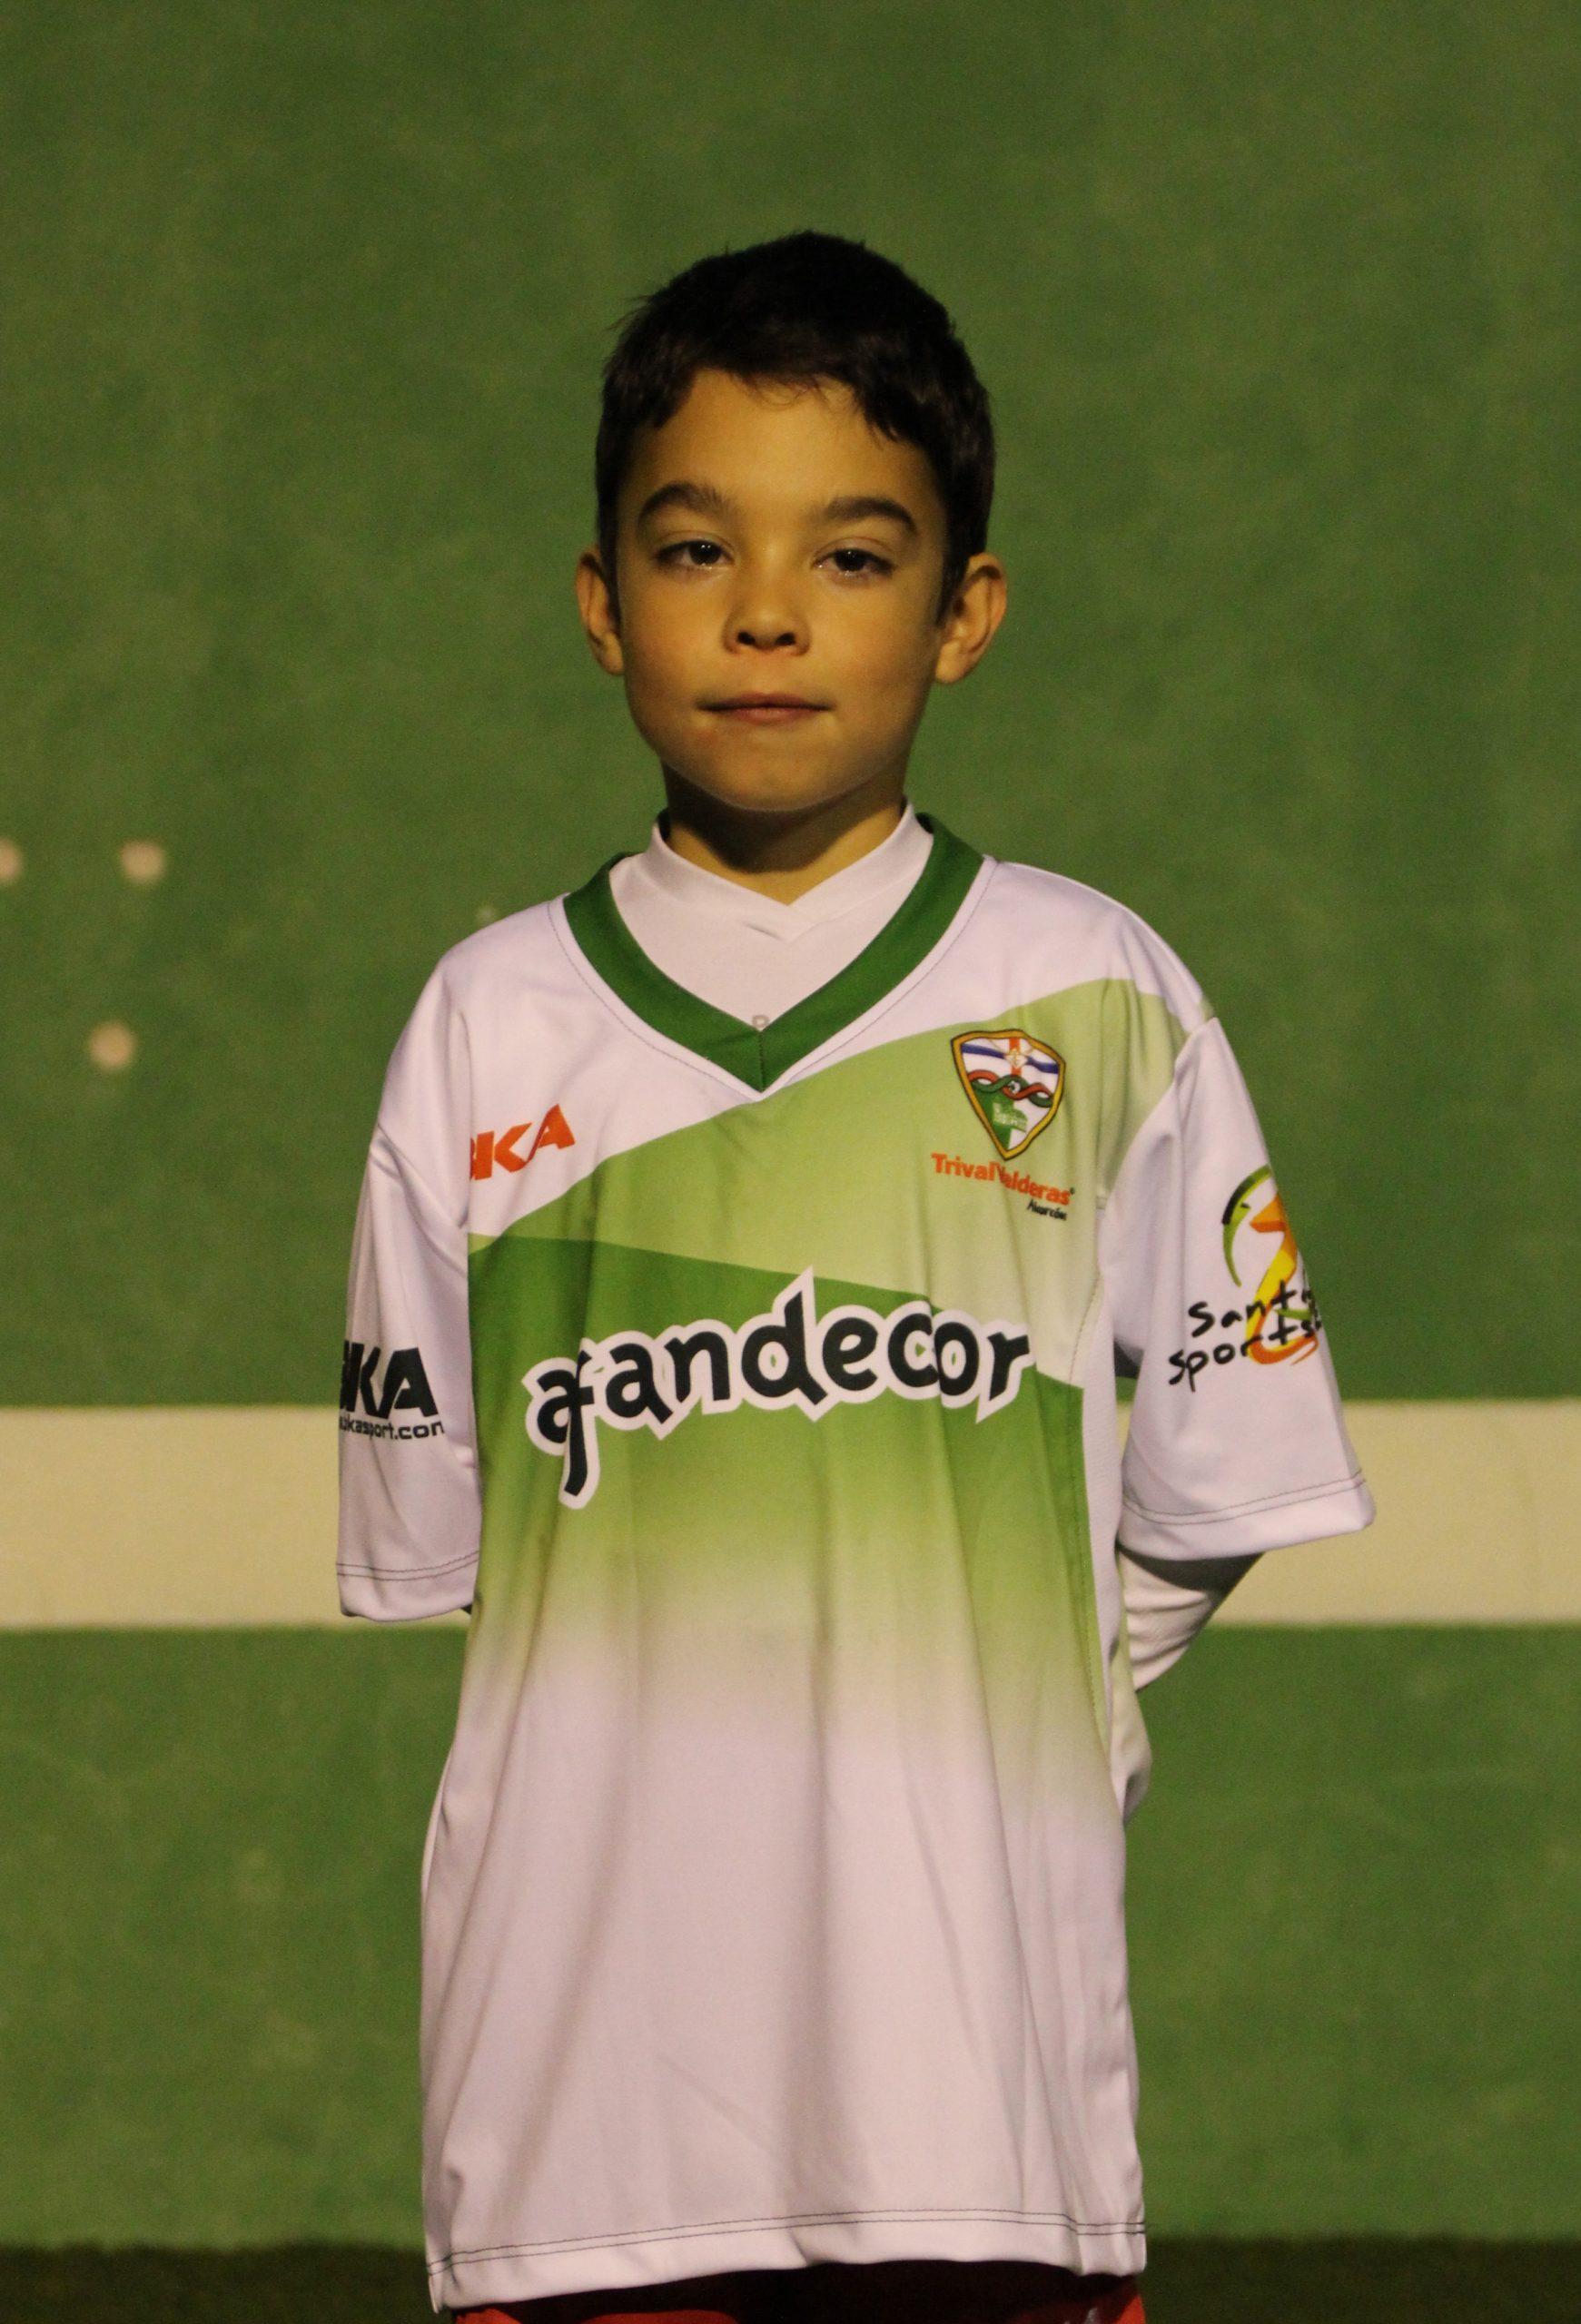 Damián Peinado Moreno